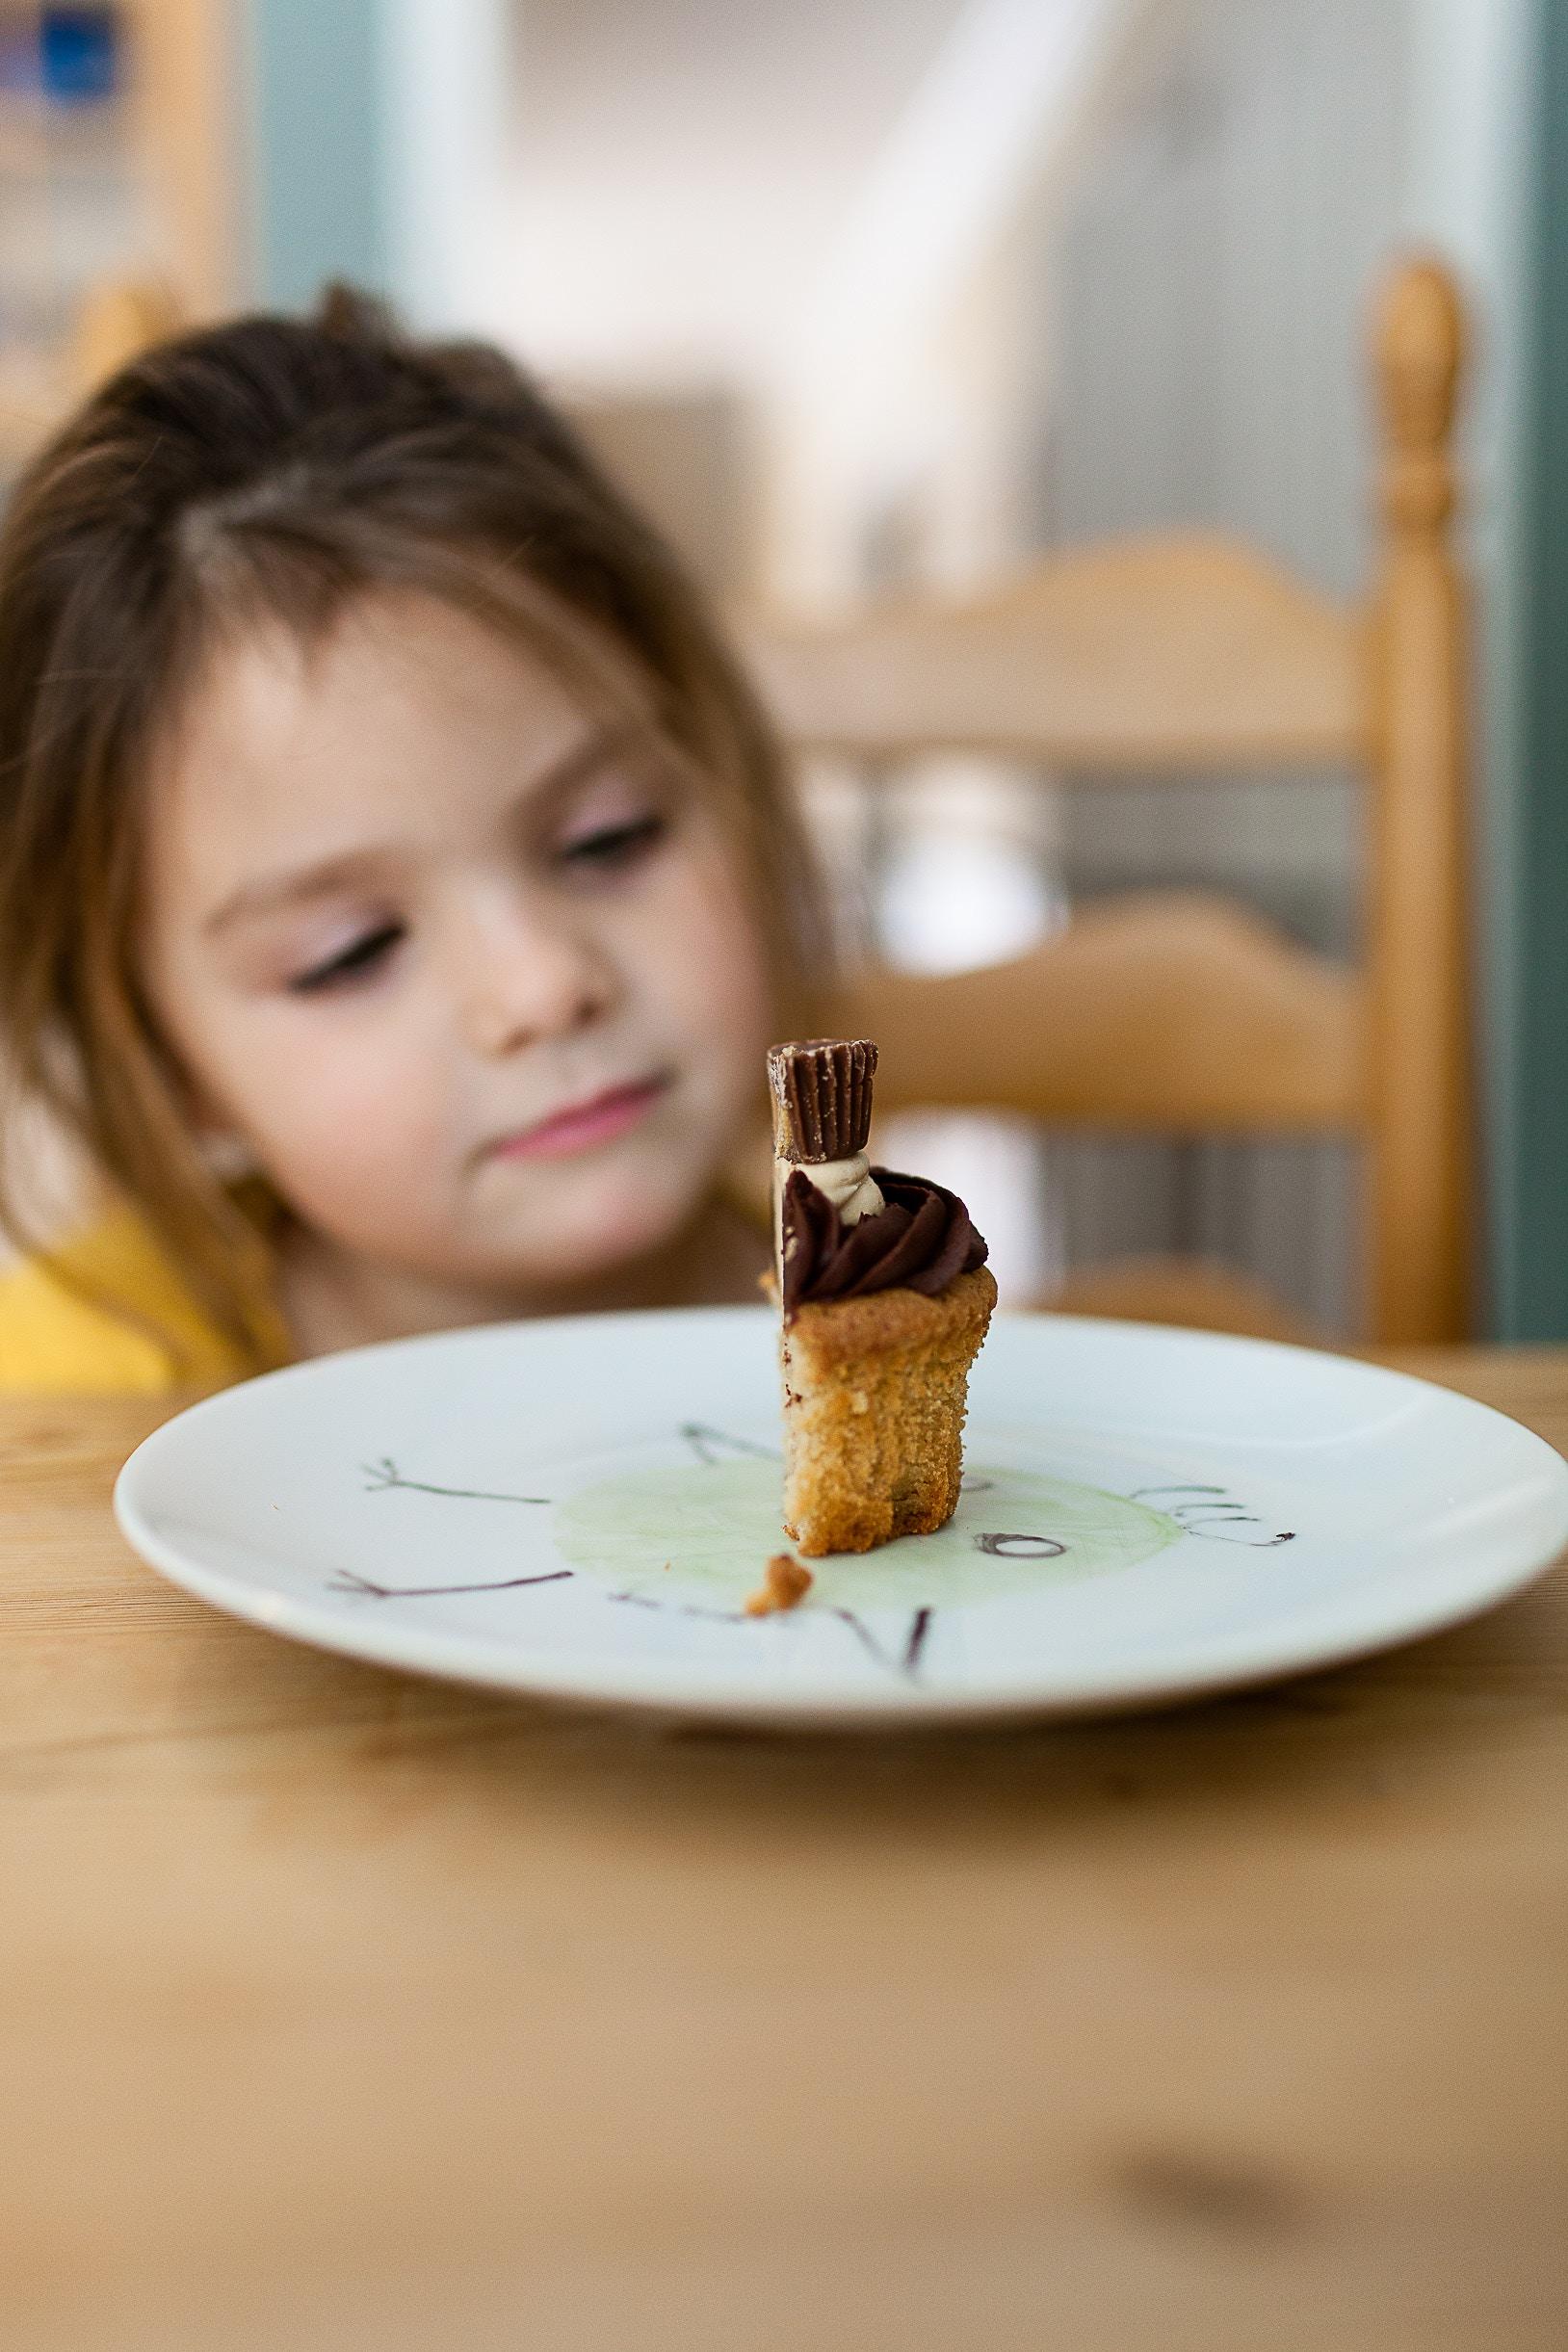 kid and cupcake